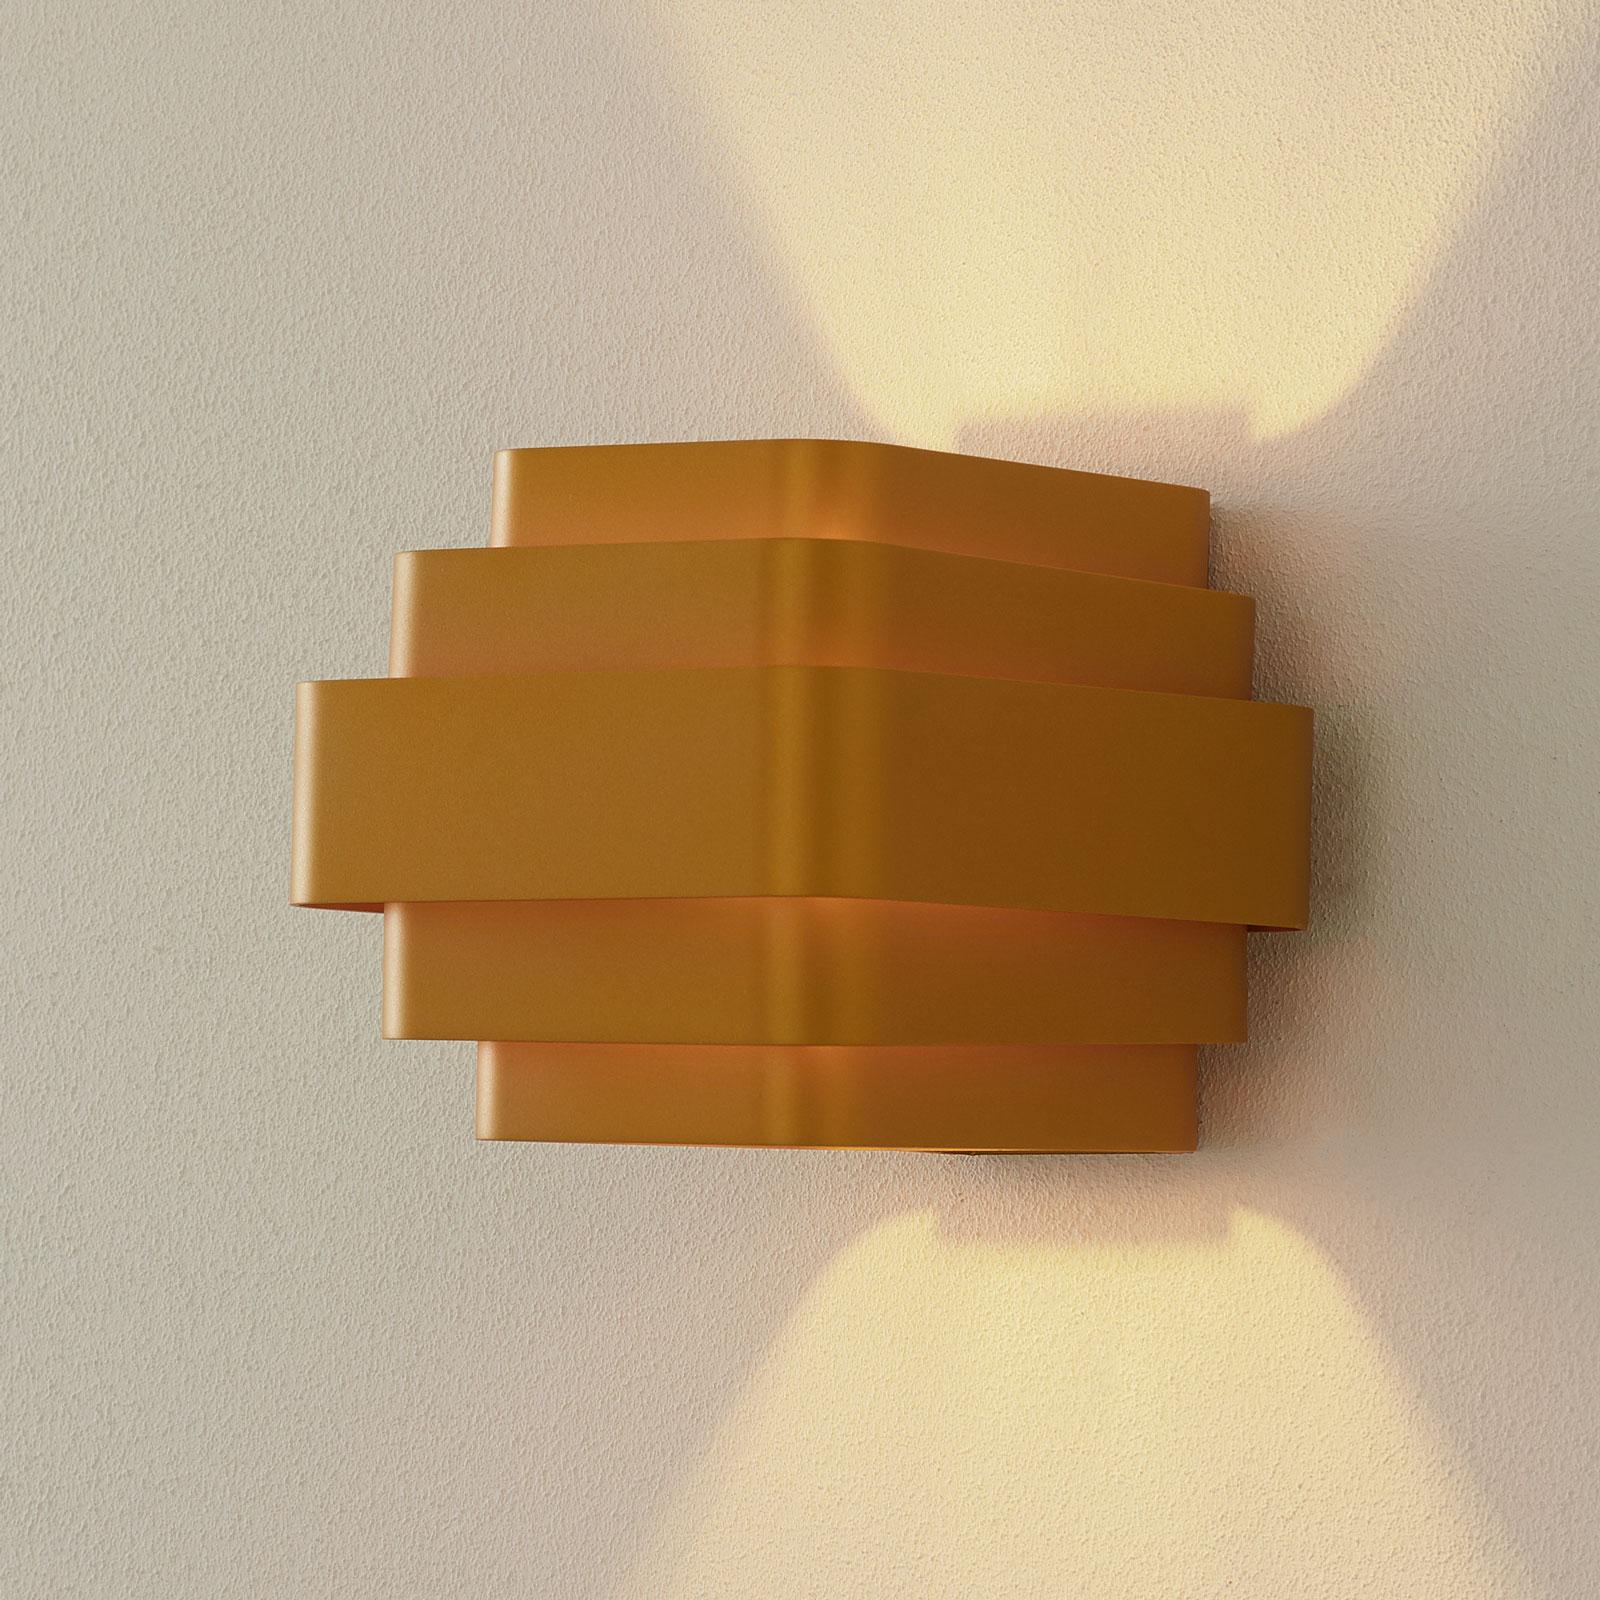 WEVER & DUCRÉ J.J.W. 02 wandlamp 18,8 cm goud